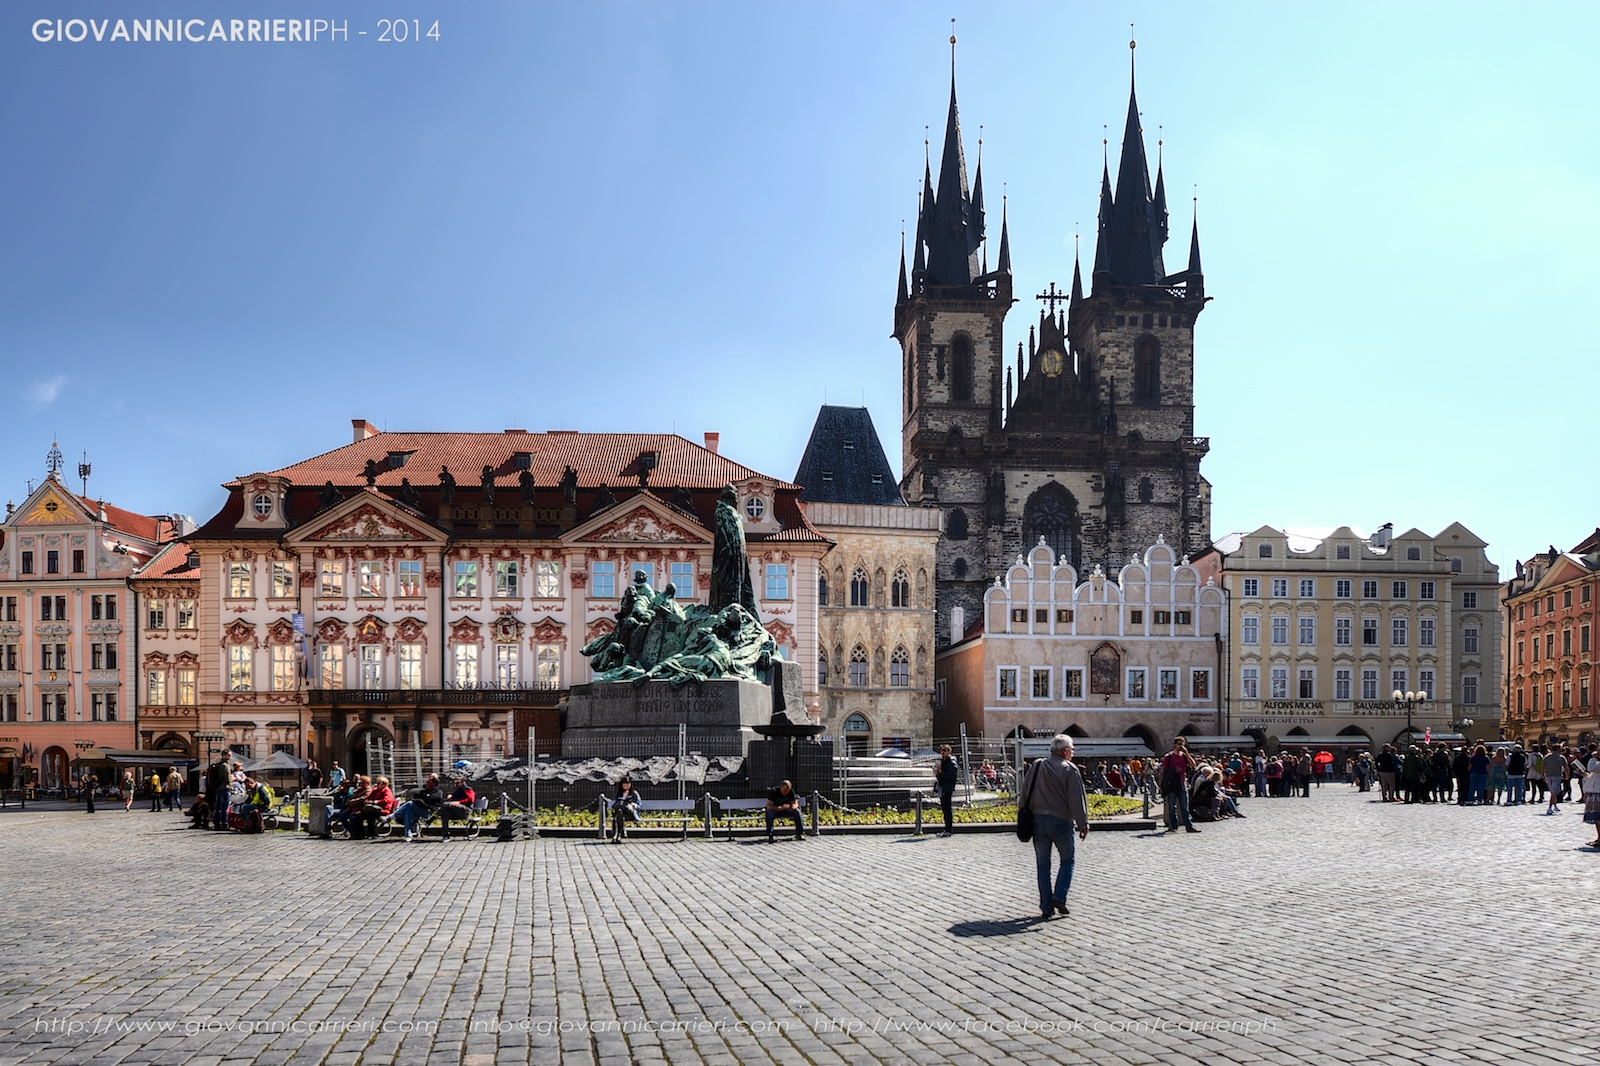 Il monumento di Jan Hus - Praga